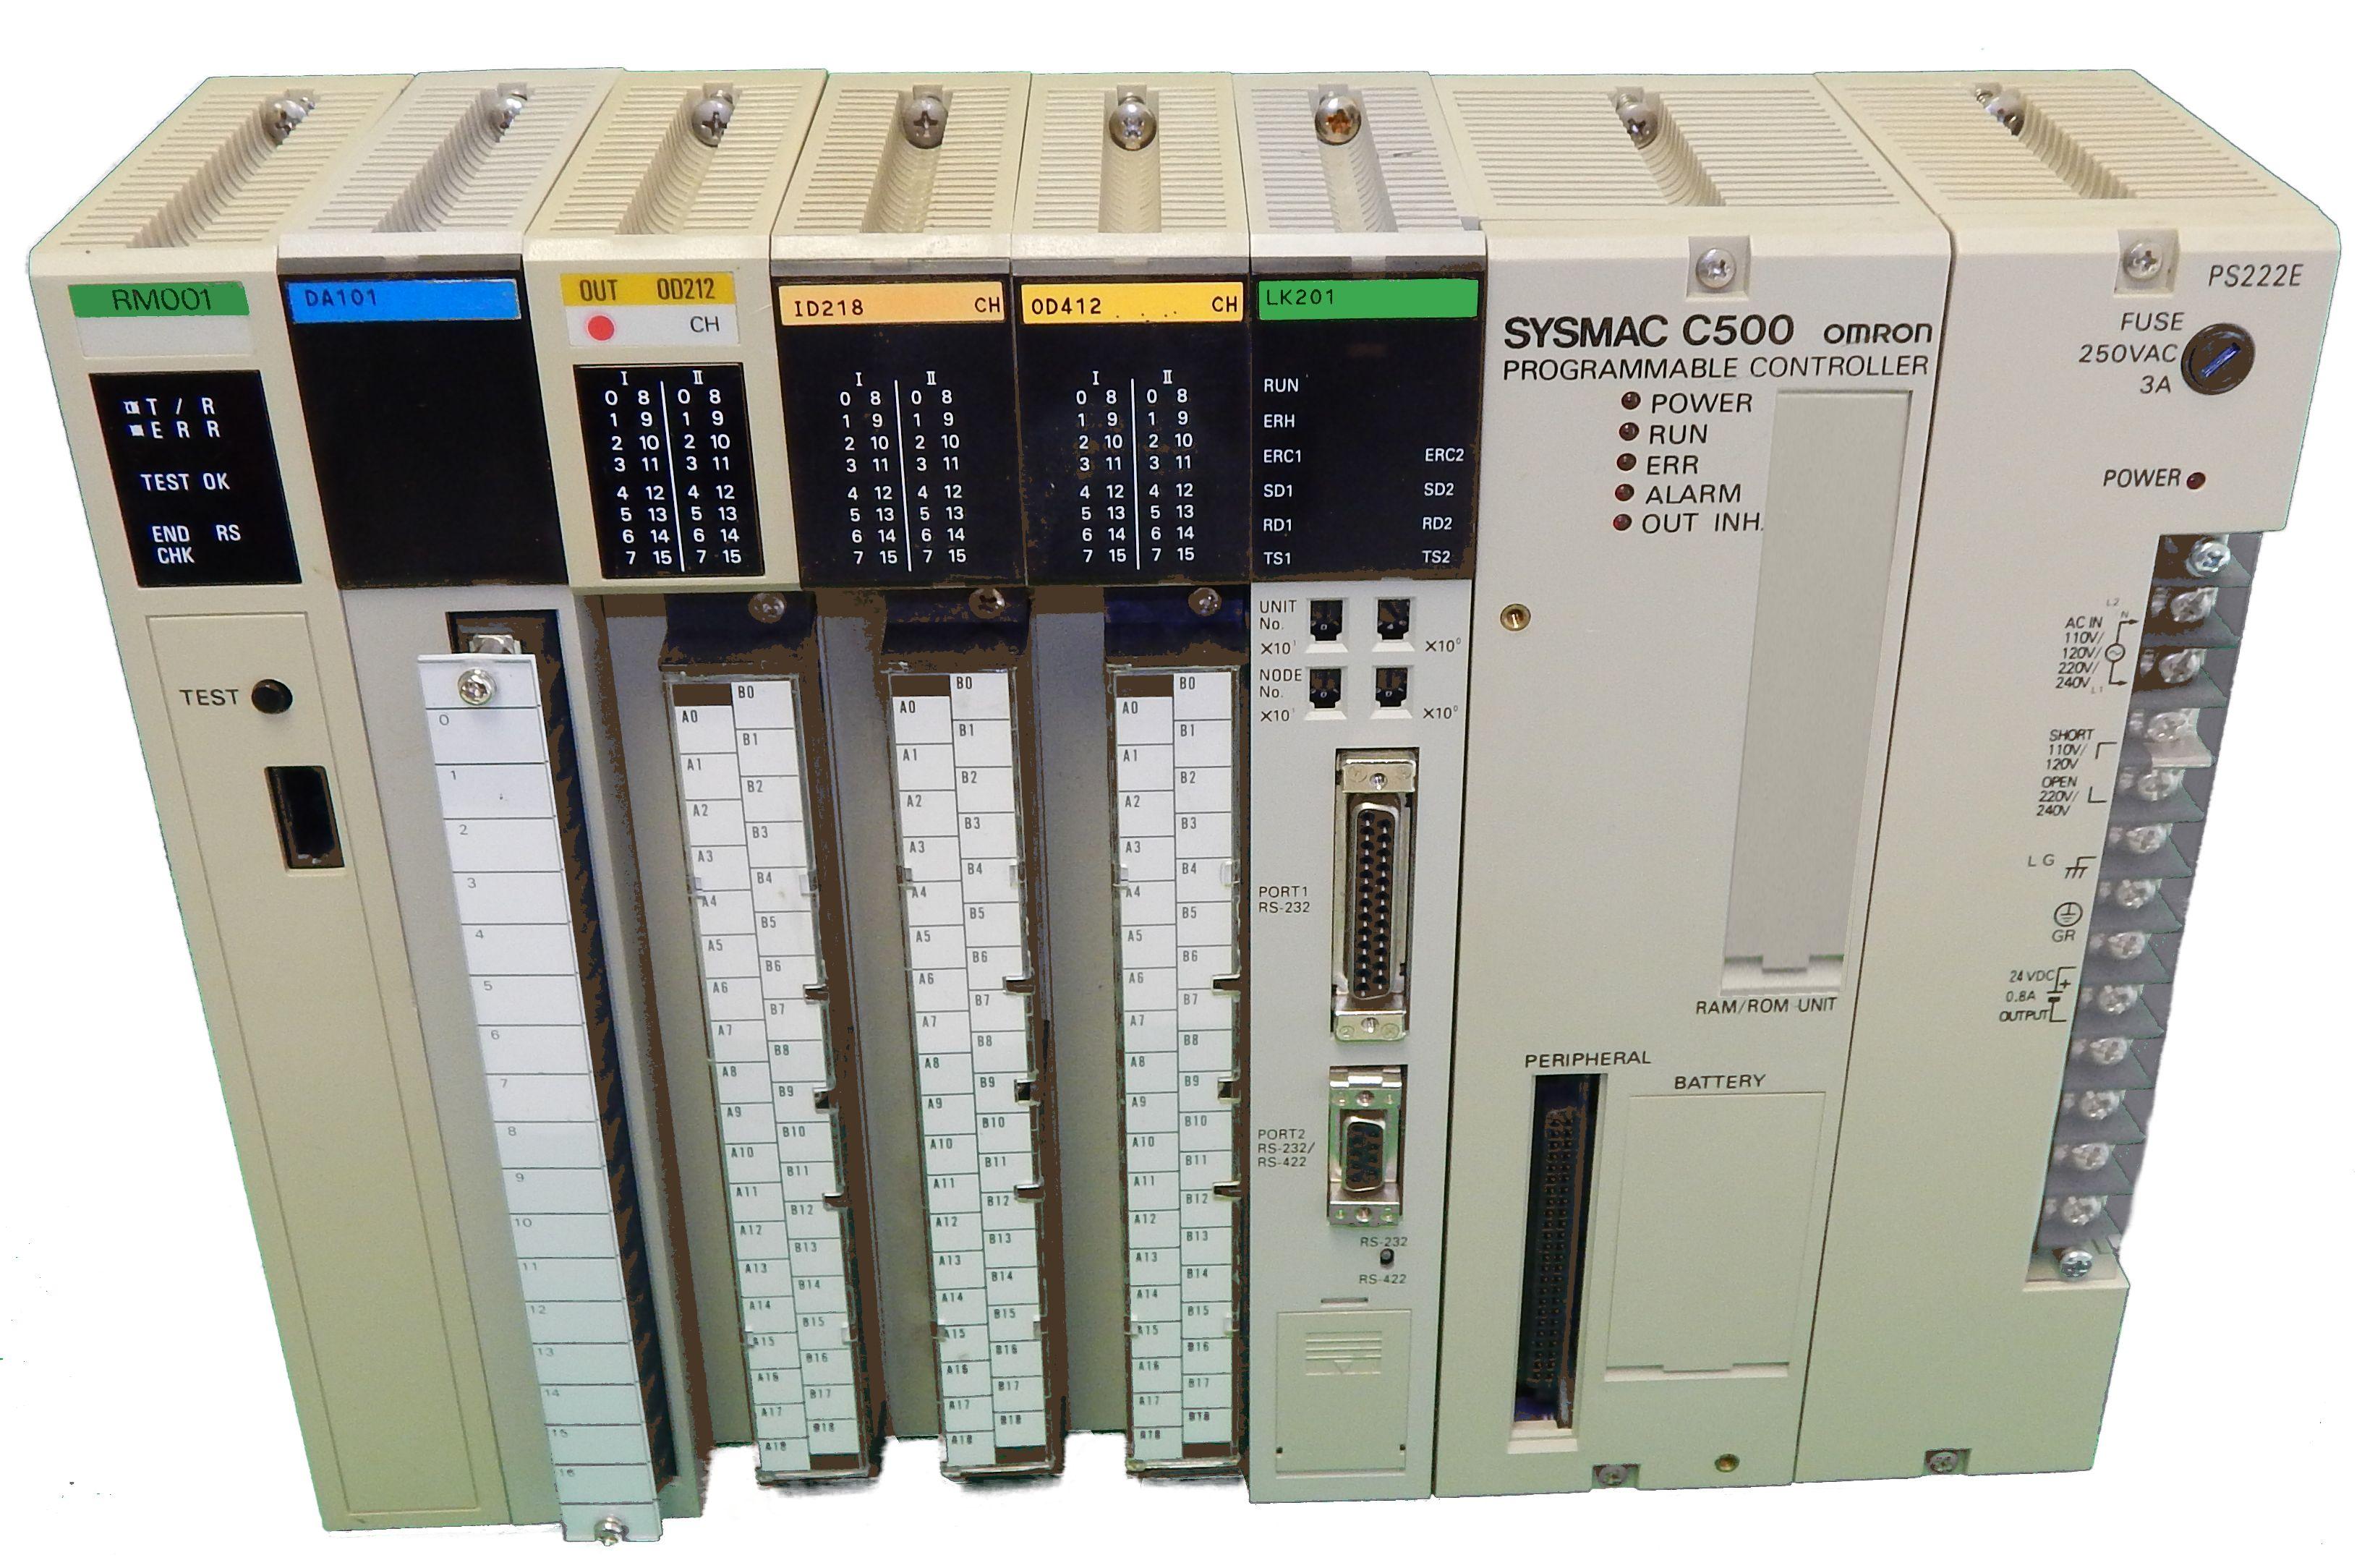 3G2C7-CPU54-E